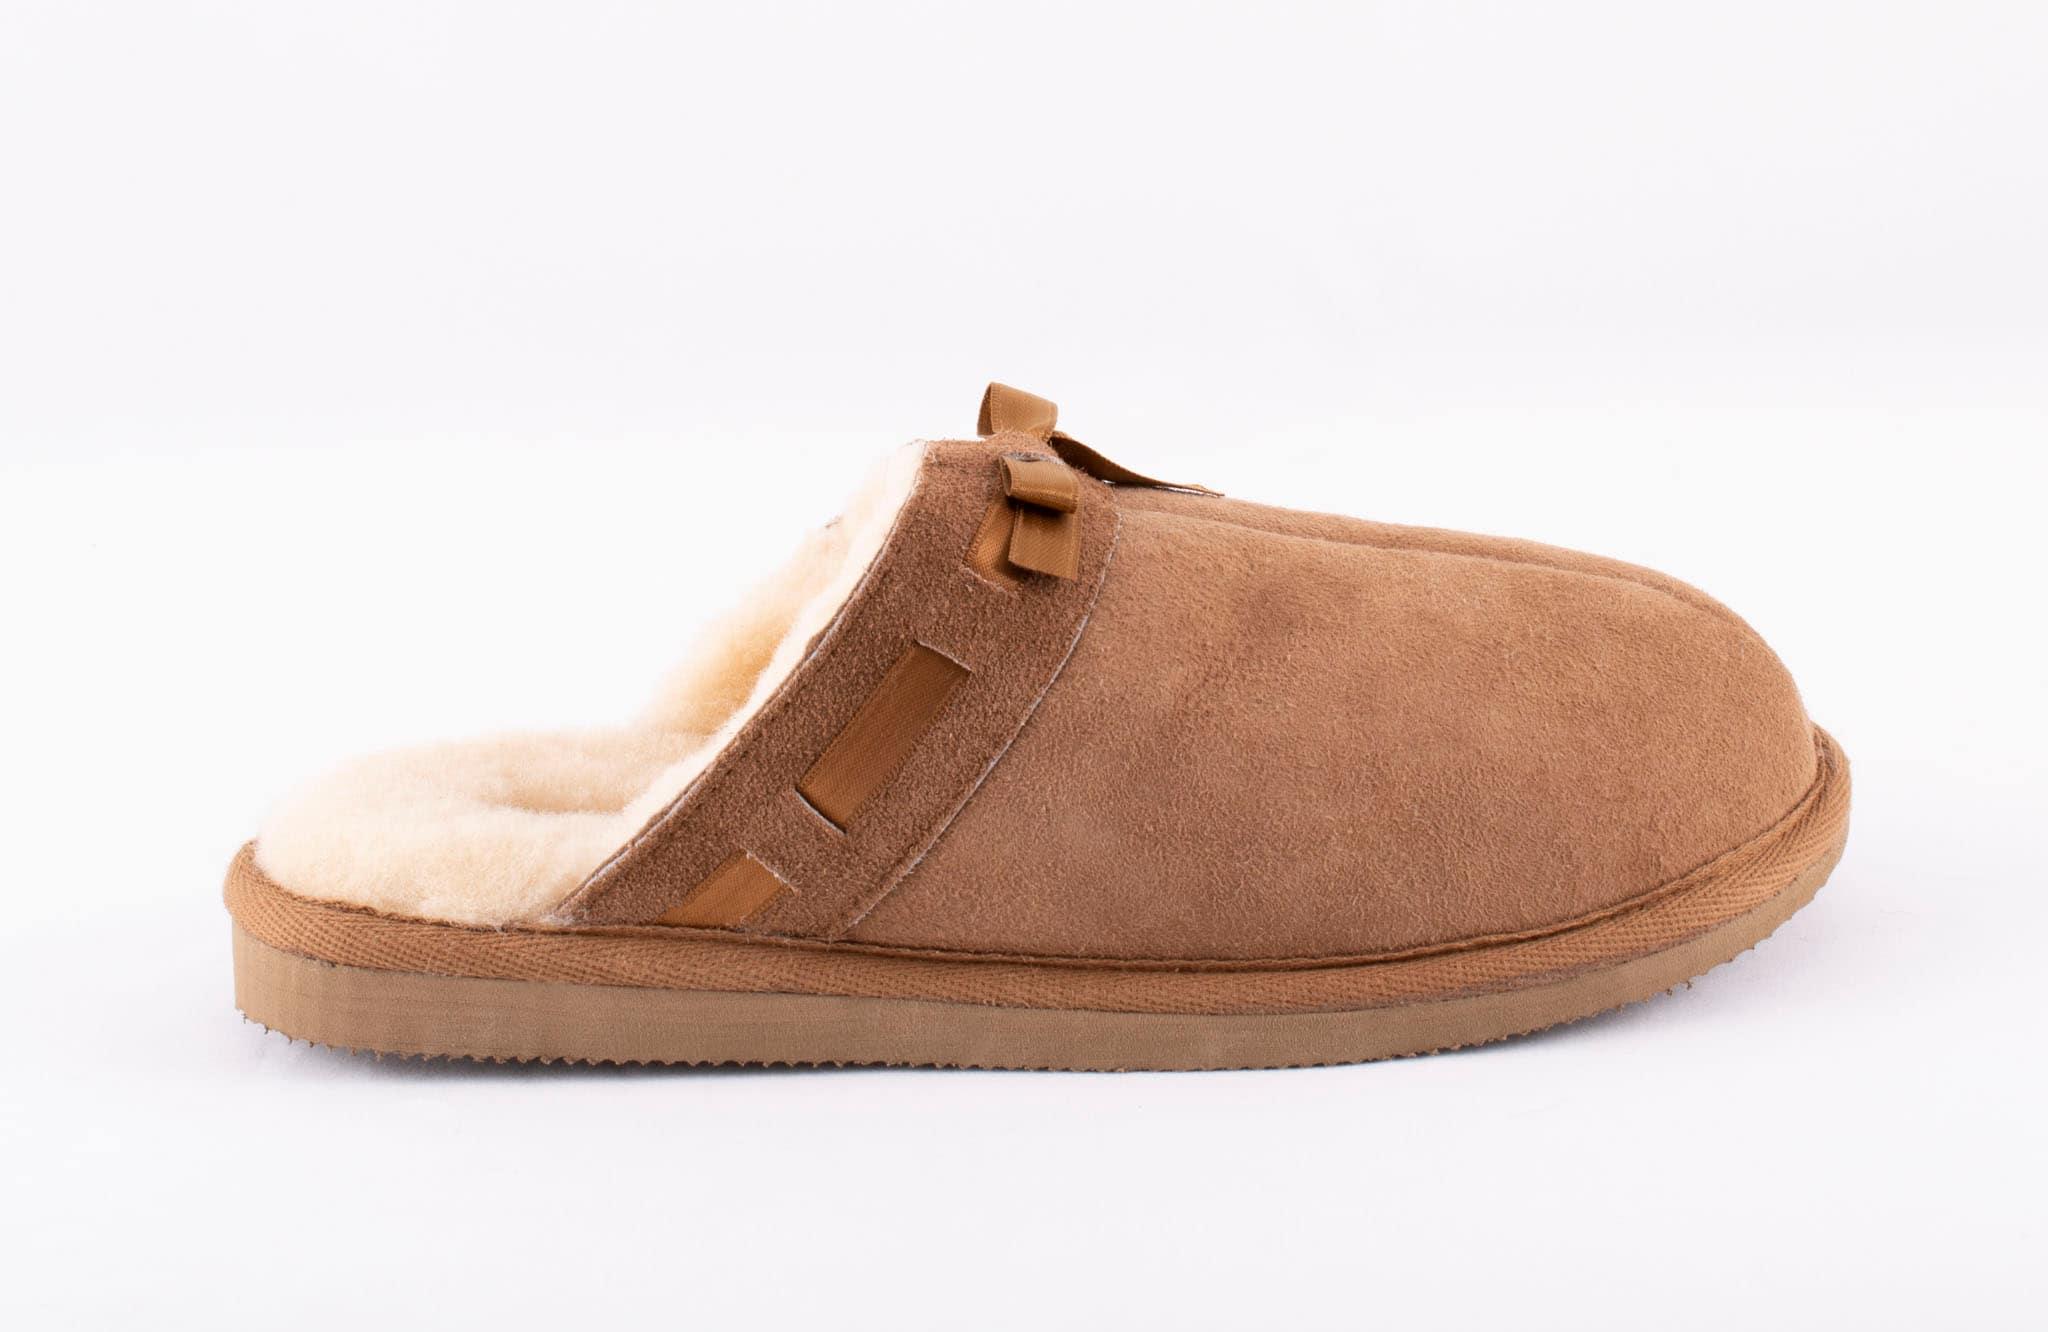 Anne sheepskin slippers Chestnut